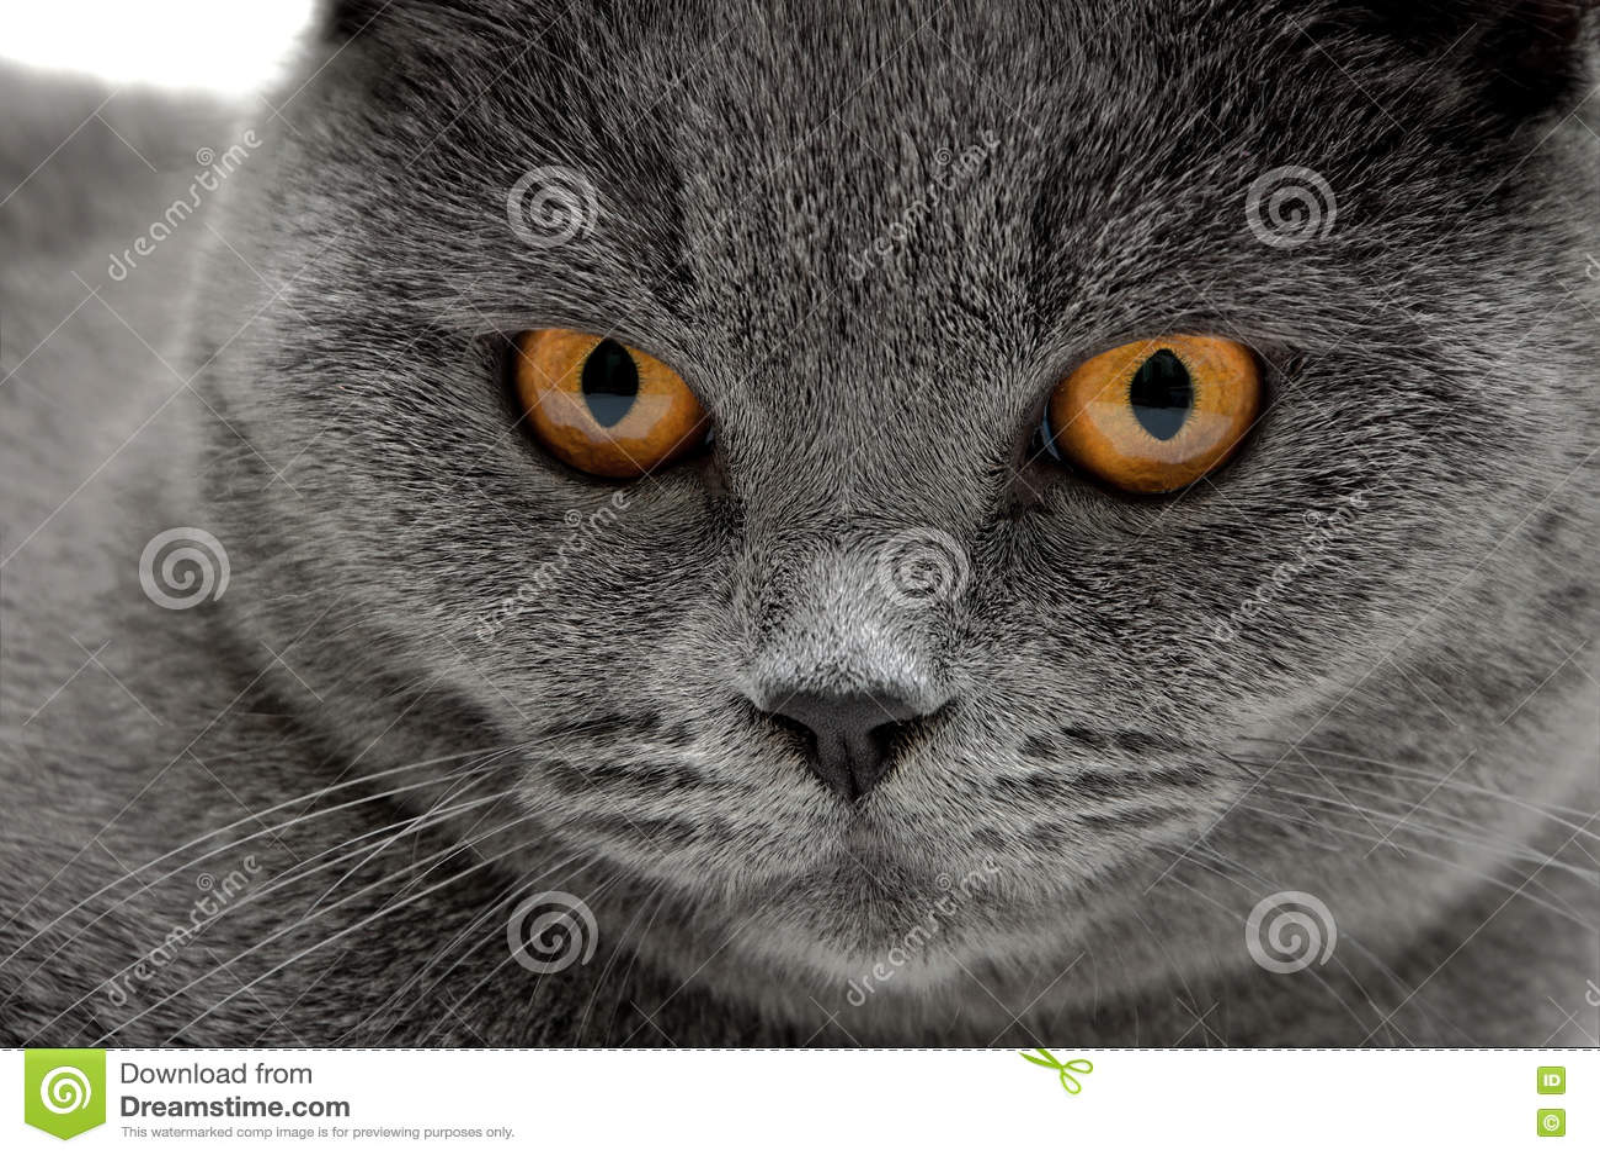 cat rescue indiana